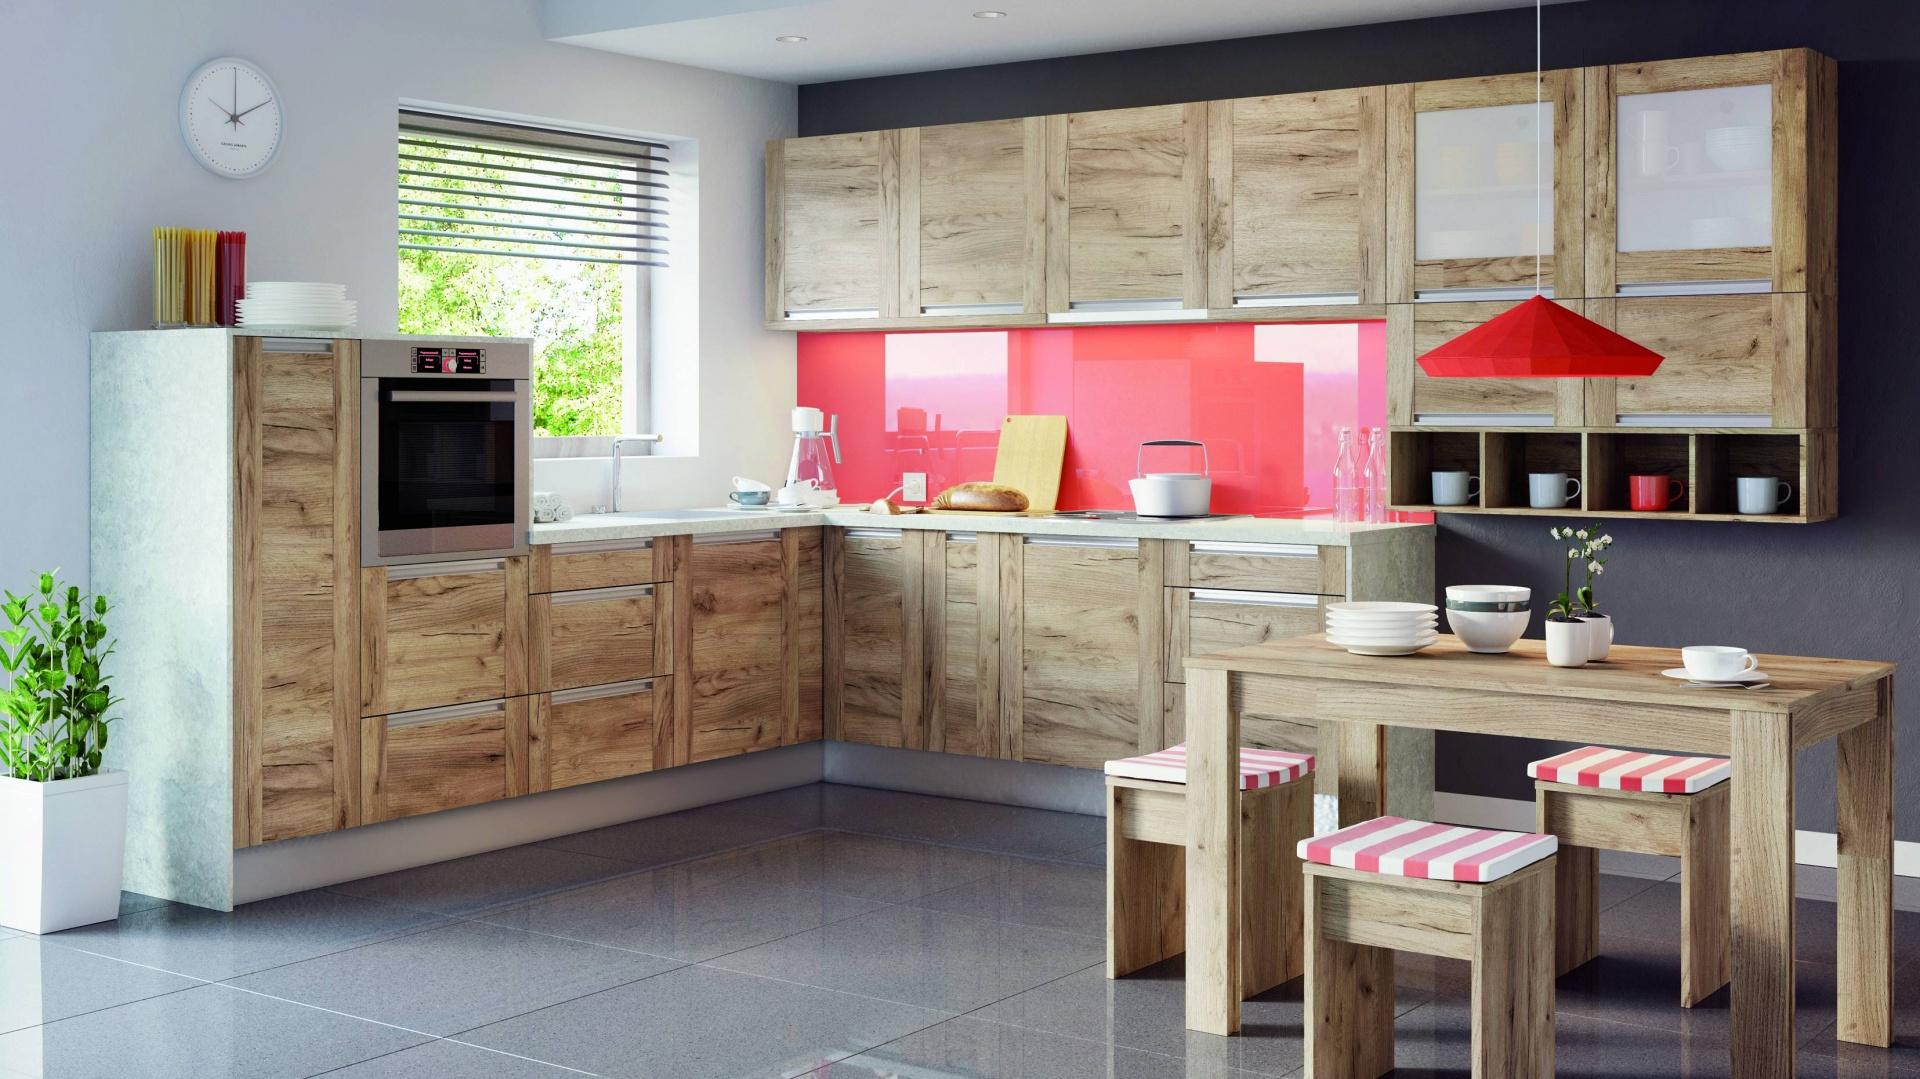 uchwyty aluminiowe meble kuchenne modne zabudowy z